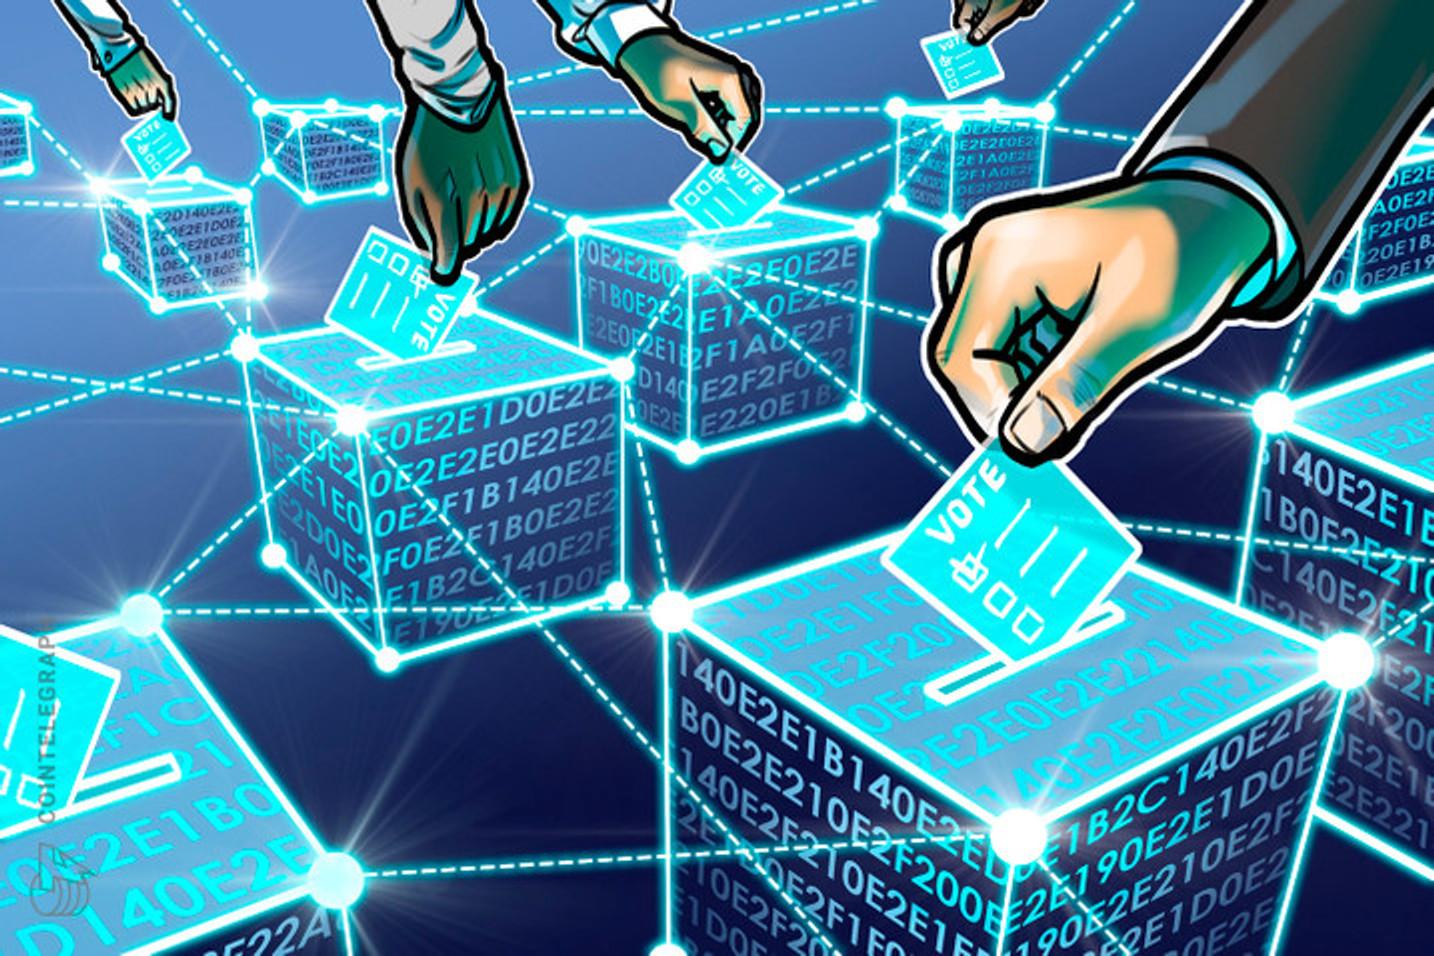 LayerXとxID、石川県加賀市でブロックチェーンとデジタルID使った電子投票システム構築へ